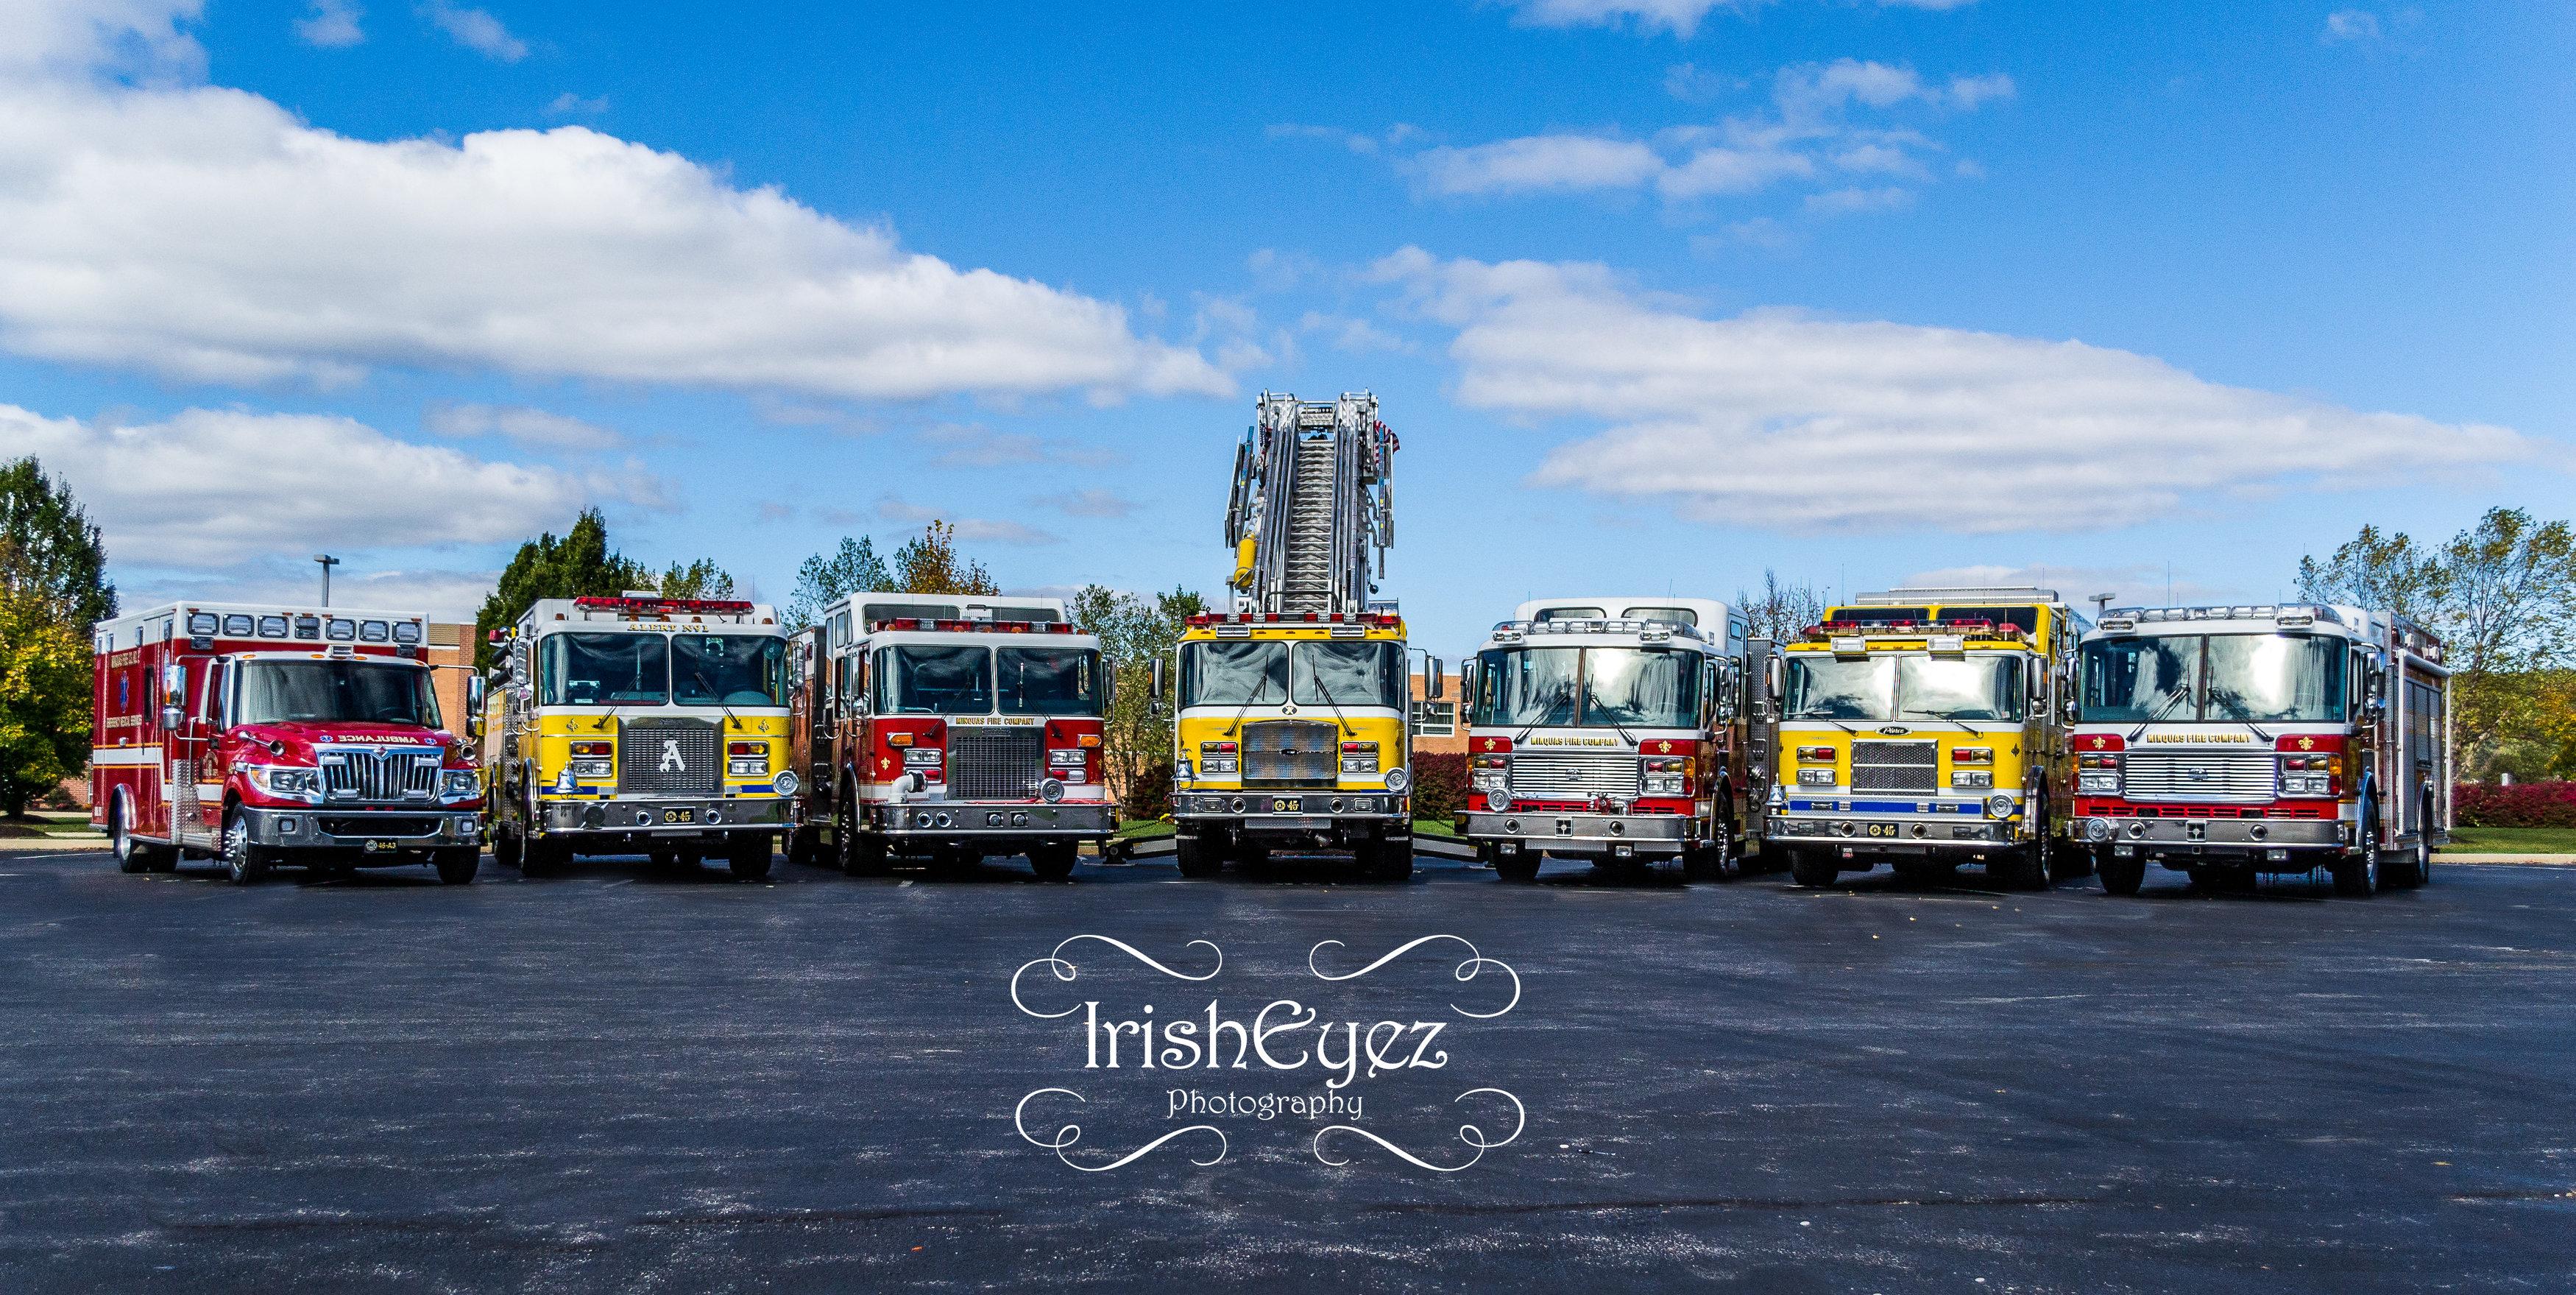 Fire Department Apparatus